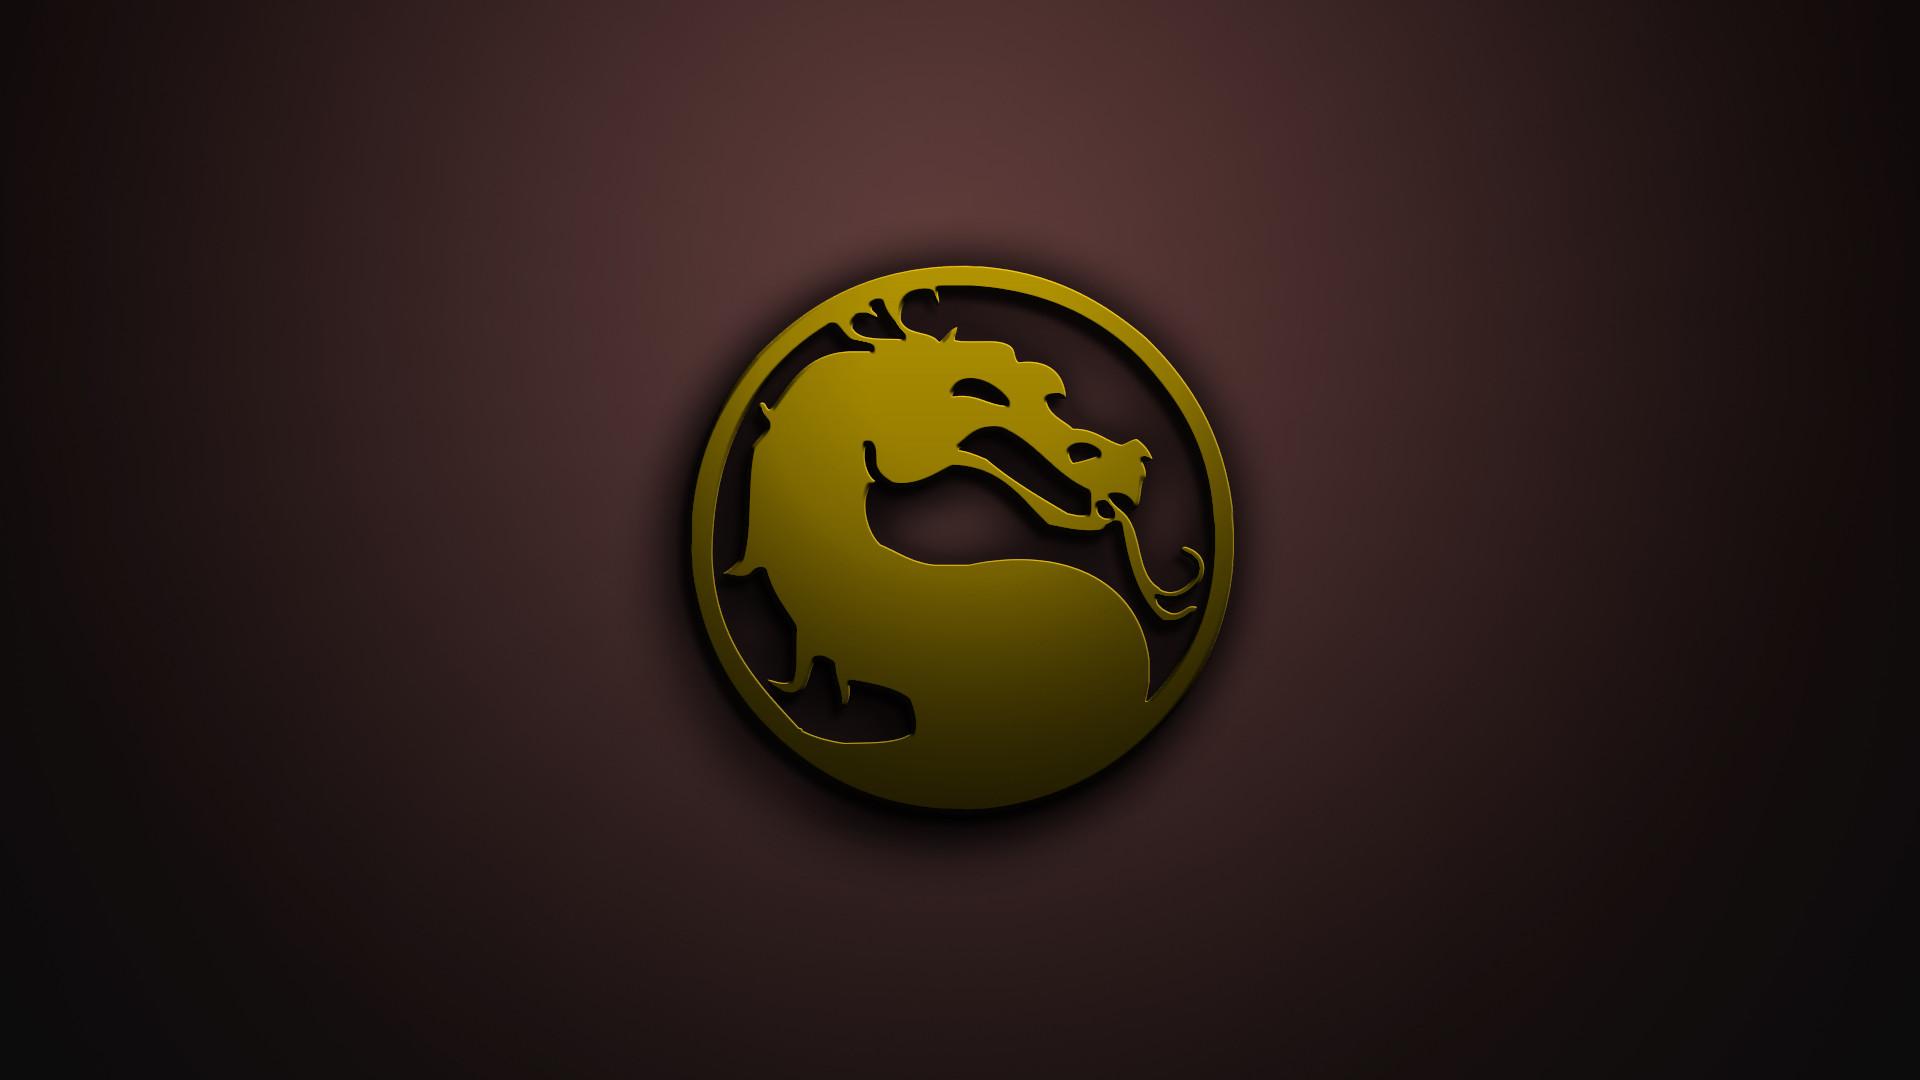 32 Mortal Kombat Logo Wallpapers On Wallpapersafari